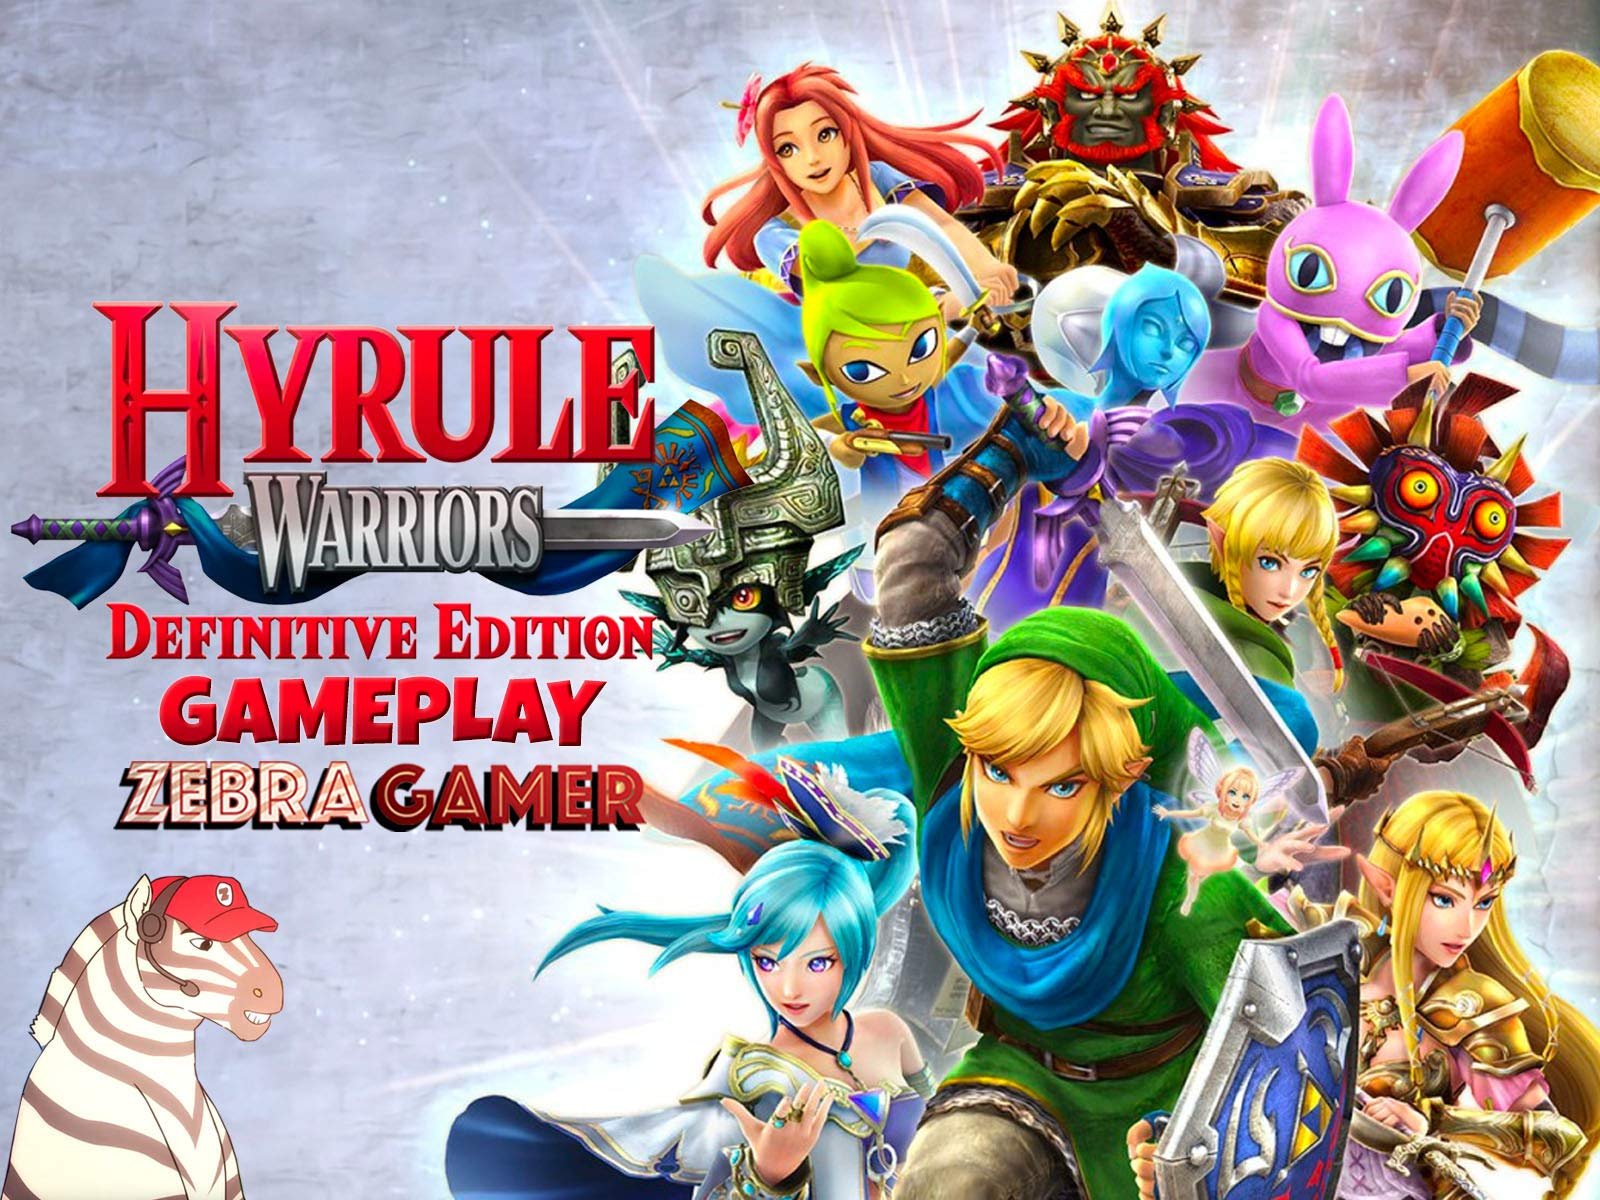 Clip: Hyrule Warriors: Definitive Edition Gameplay - Zebra Gamer - Season 1